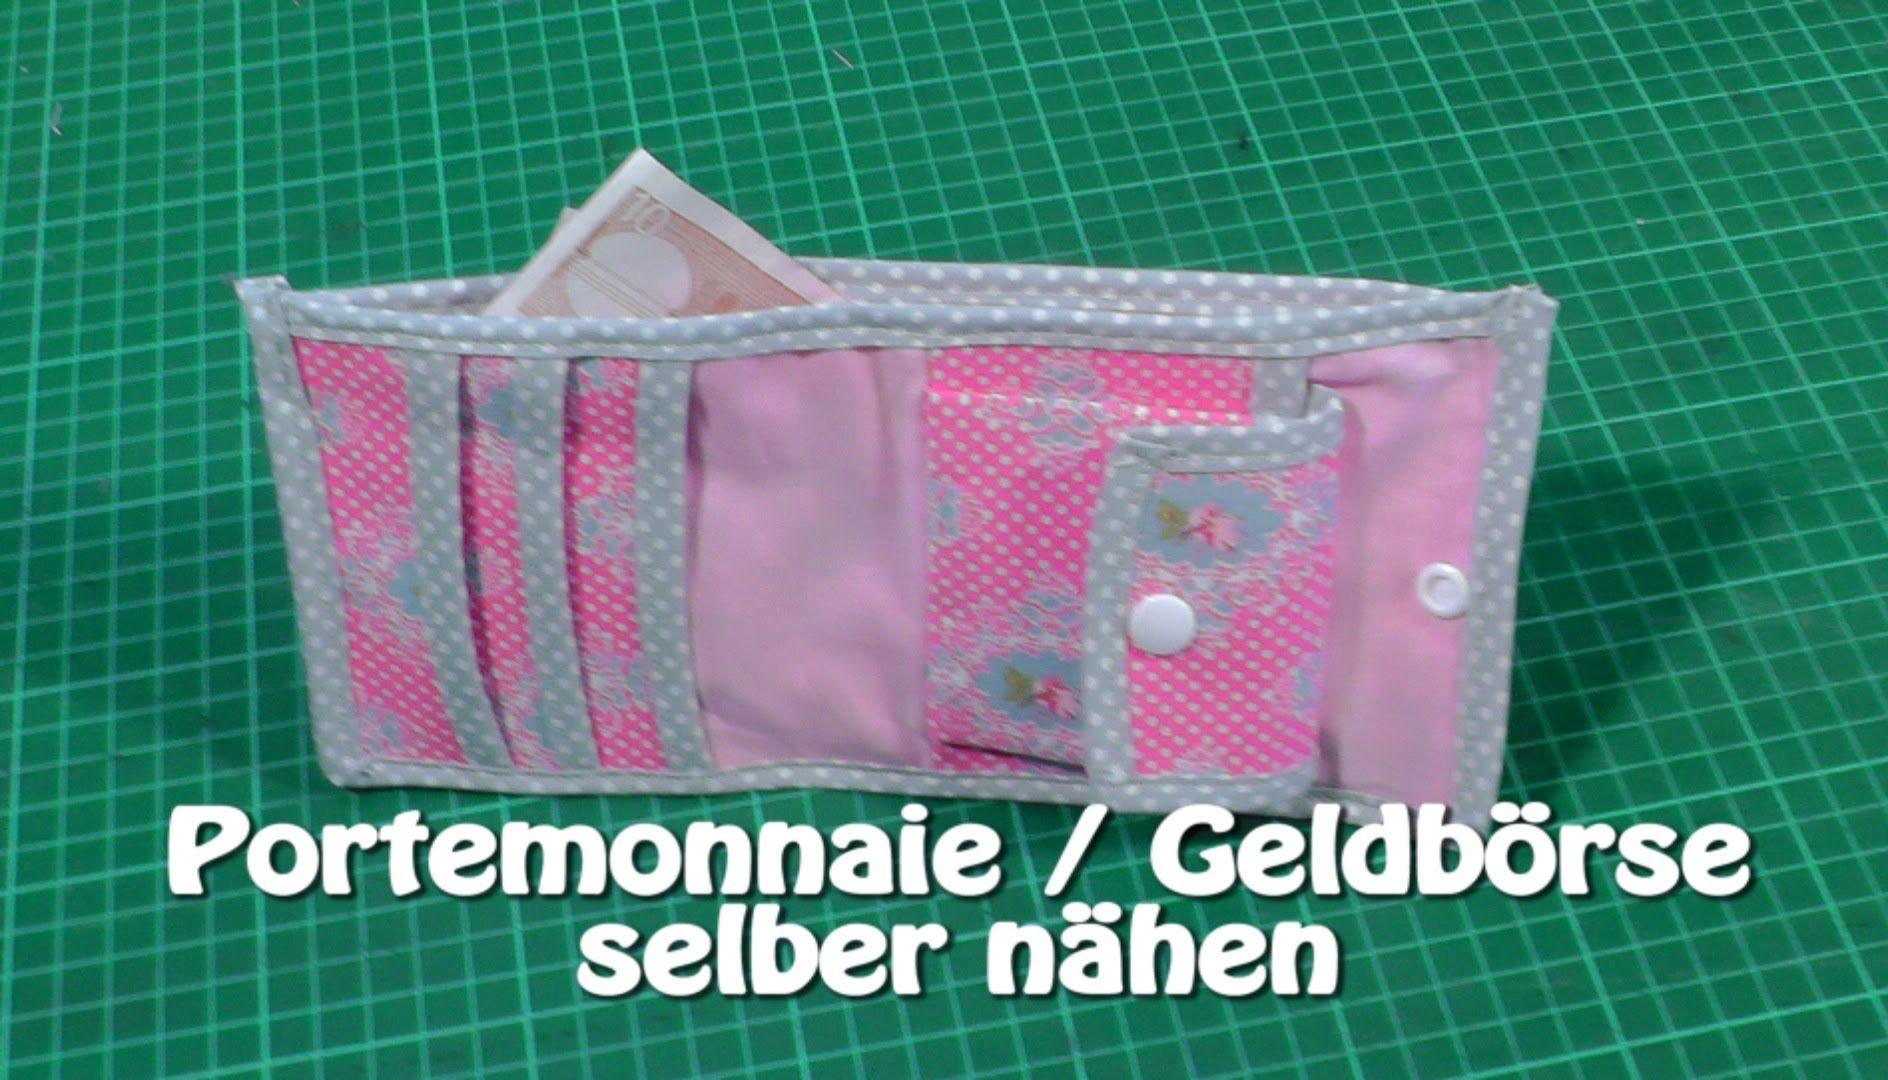 Charmant Portemonnaie Nähmustern Bilder - Strickmuster-Ideen ...